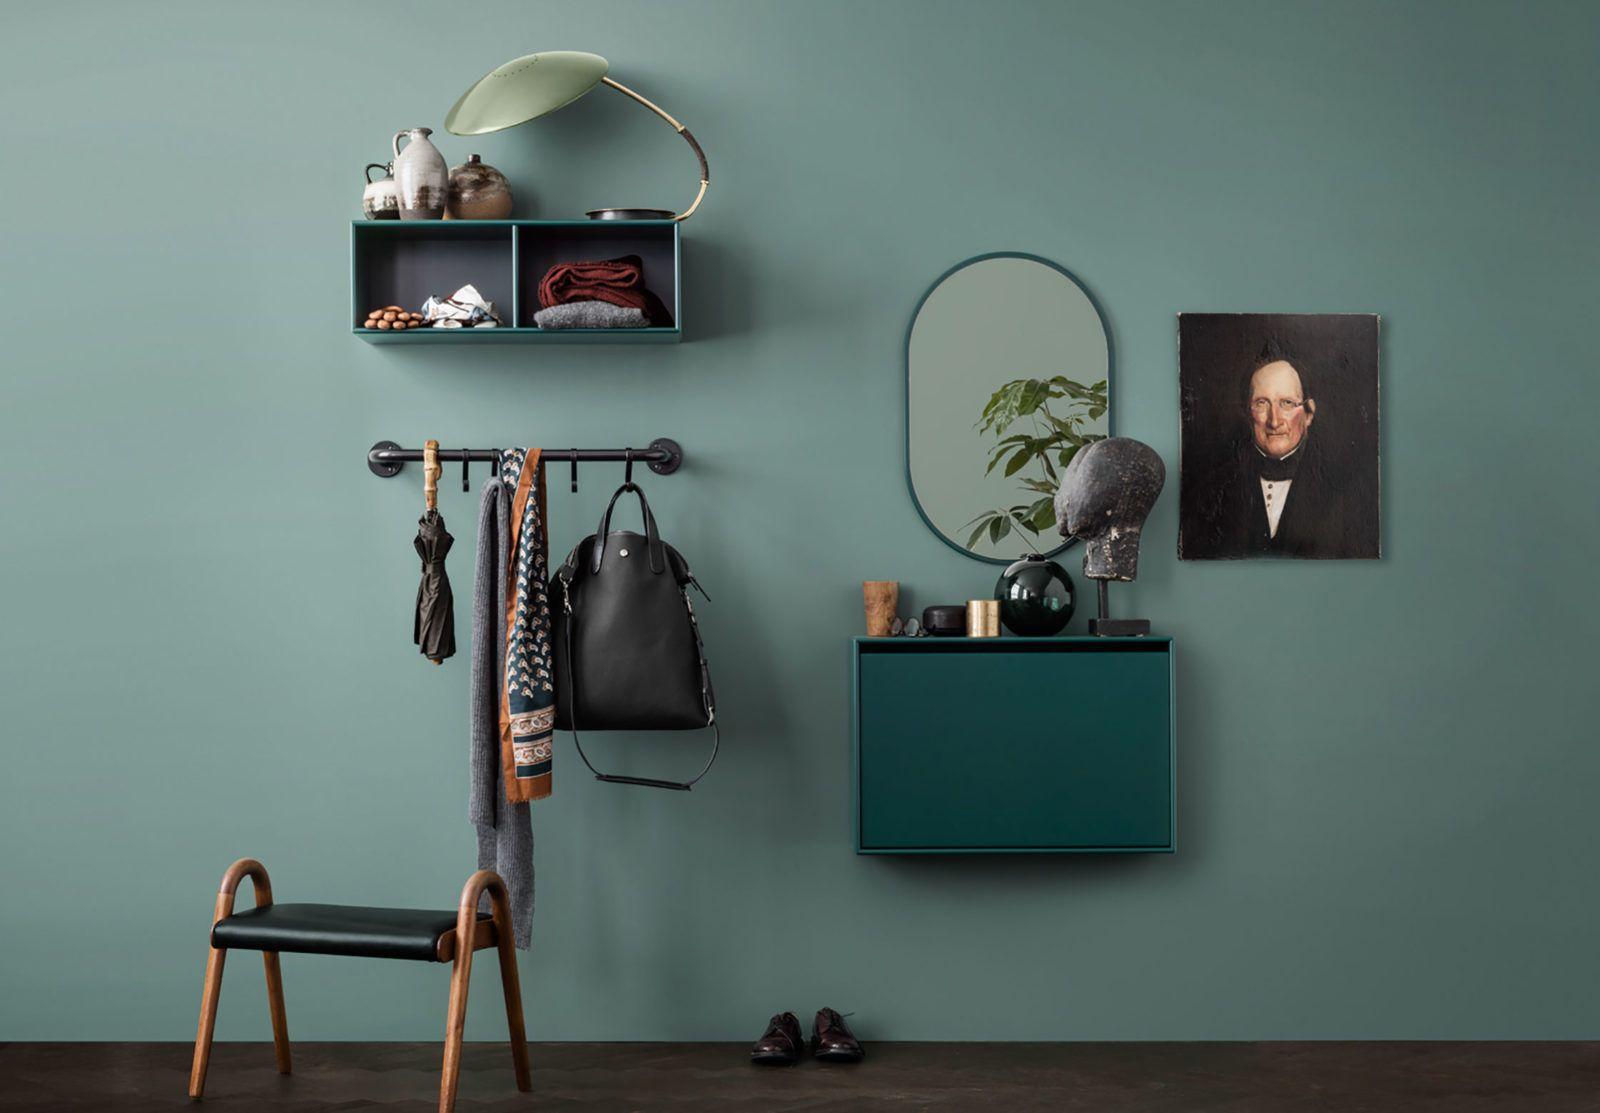 Danish modernism takes a playful turn in the design studio of Mads Sætter-Lassen and Emil Krøyer